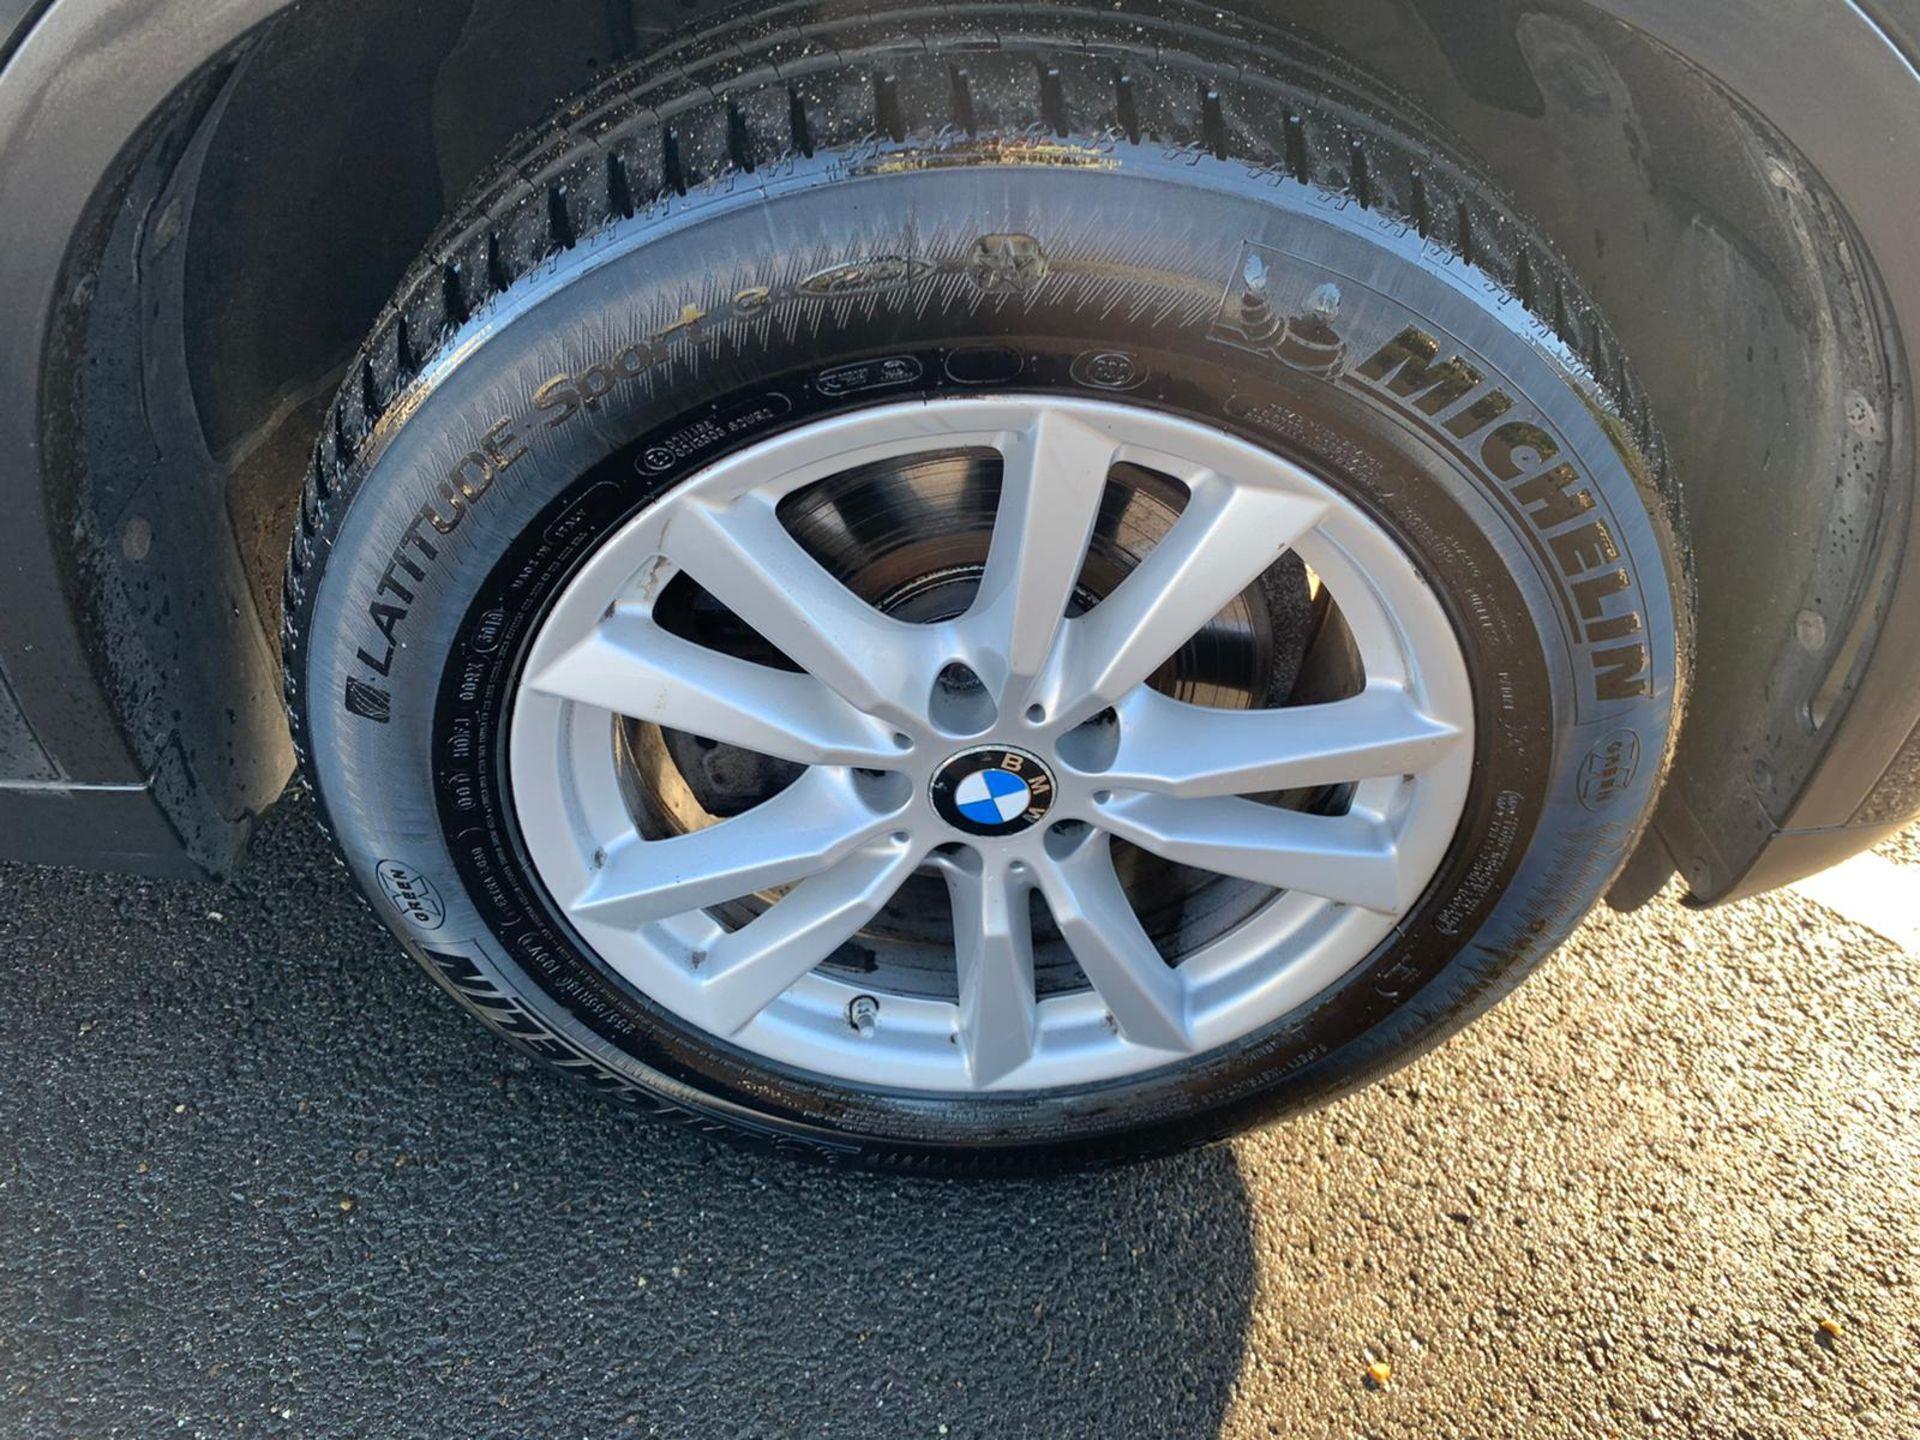 "(Reserve Met) BMW X5 2.0d S-DRIVE ""Special Equipment"" Auto- 7 Seater -16 Reg - Sat Nav- (New Shape) - Image 14 of 43"